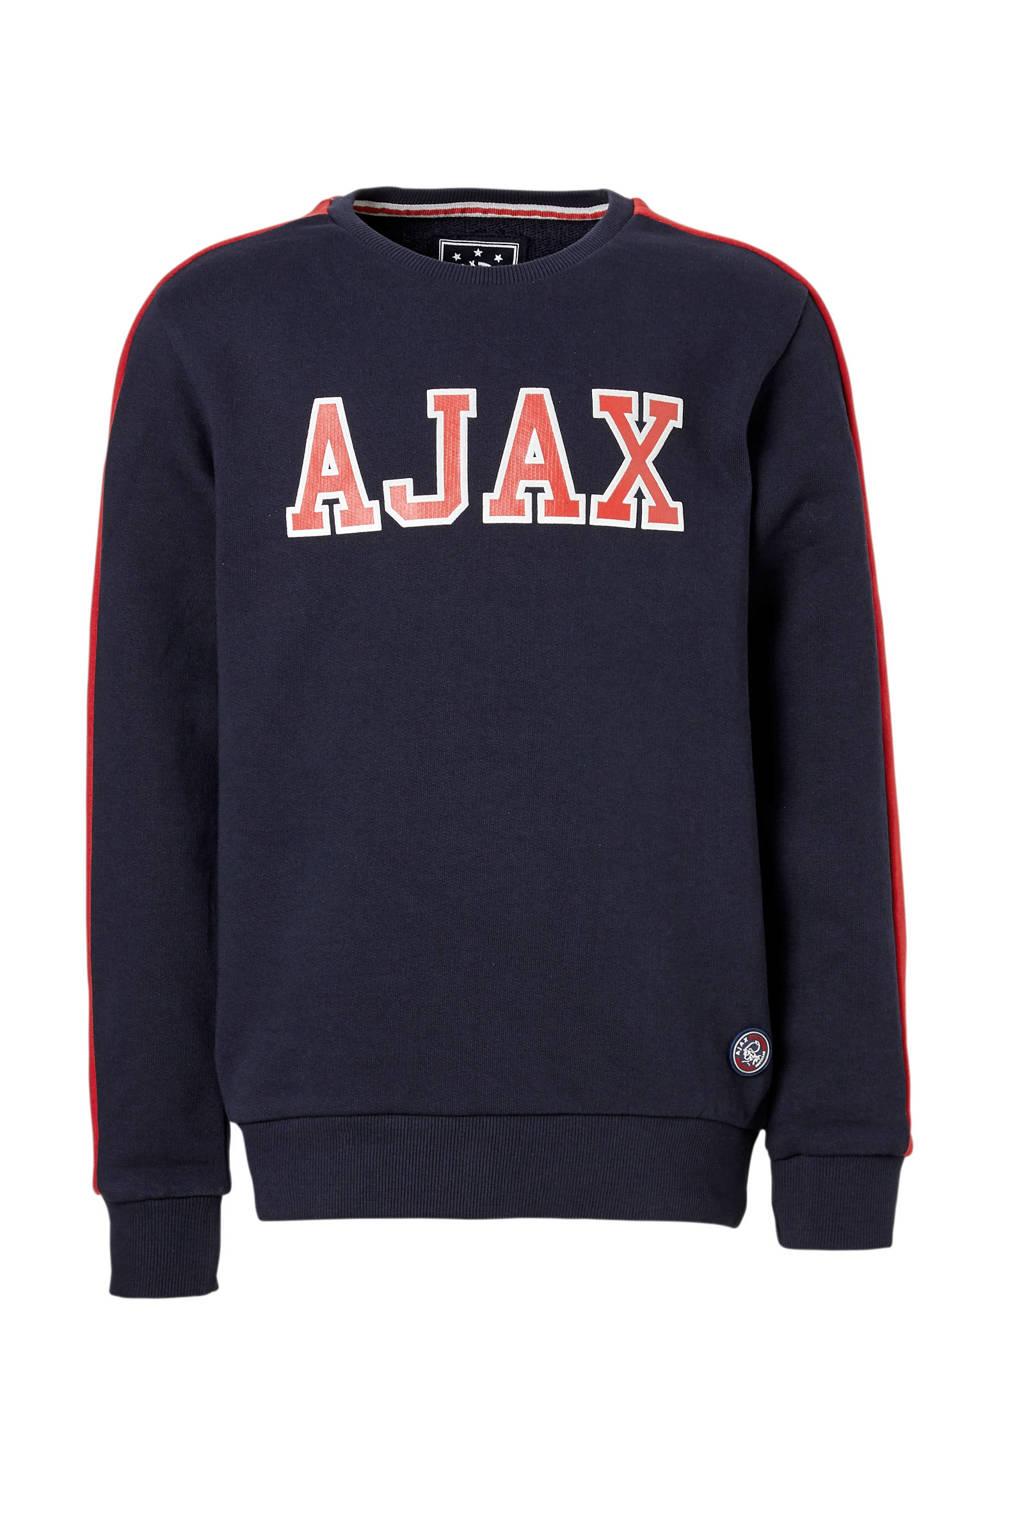 Ajax sweater Rowen blauw, Donkerblauw/rood/wit